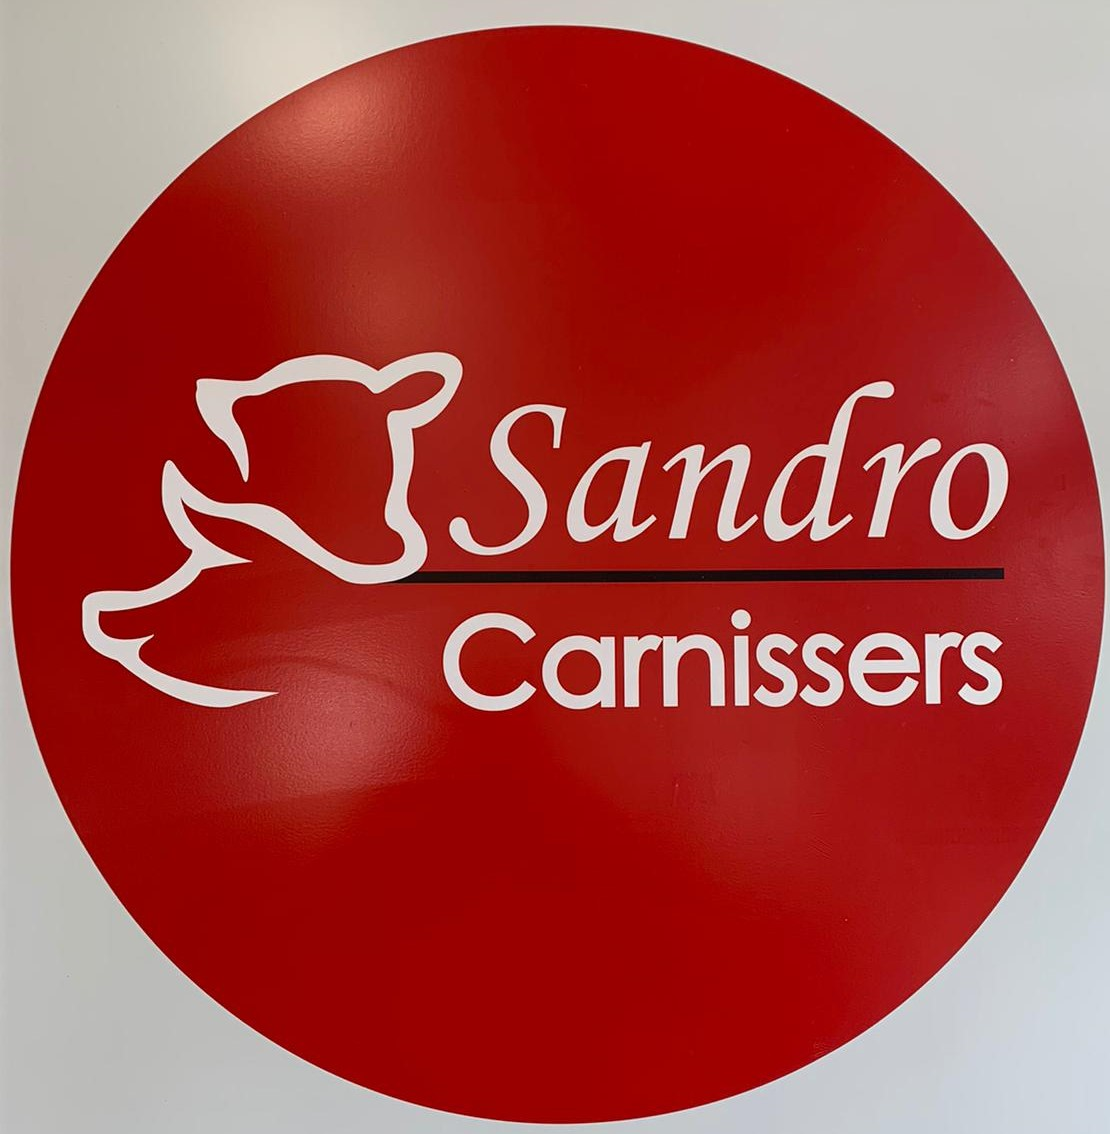 Sandro Carnissers